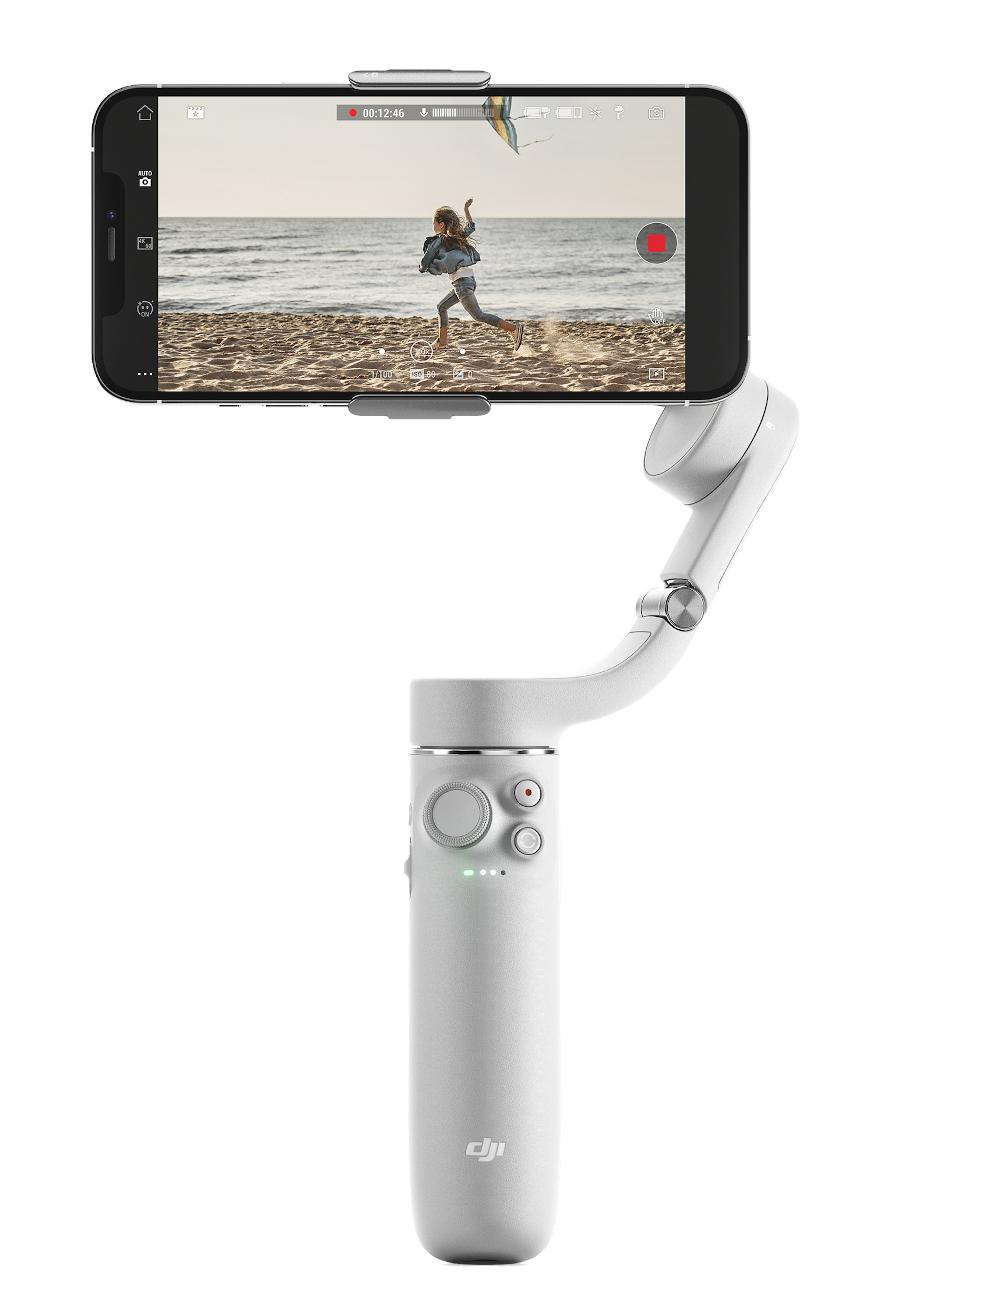 DJI OM5: Smart smartphone gimbal with integrated selfie stick for 159 euros